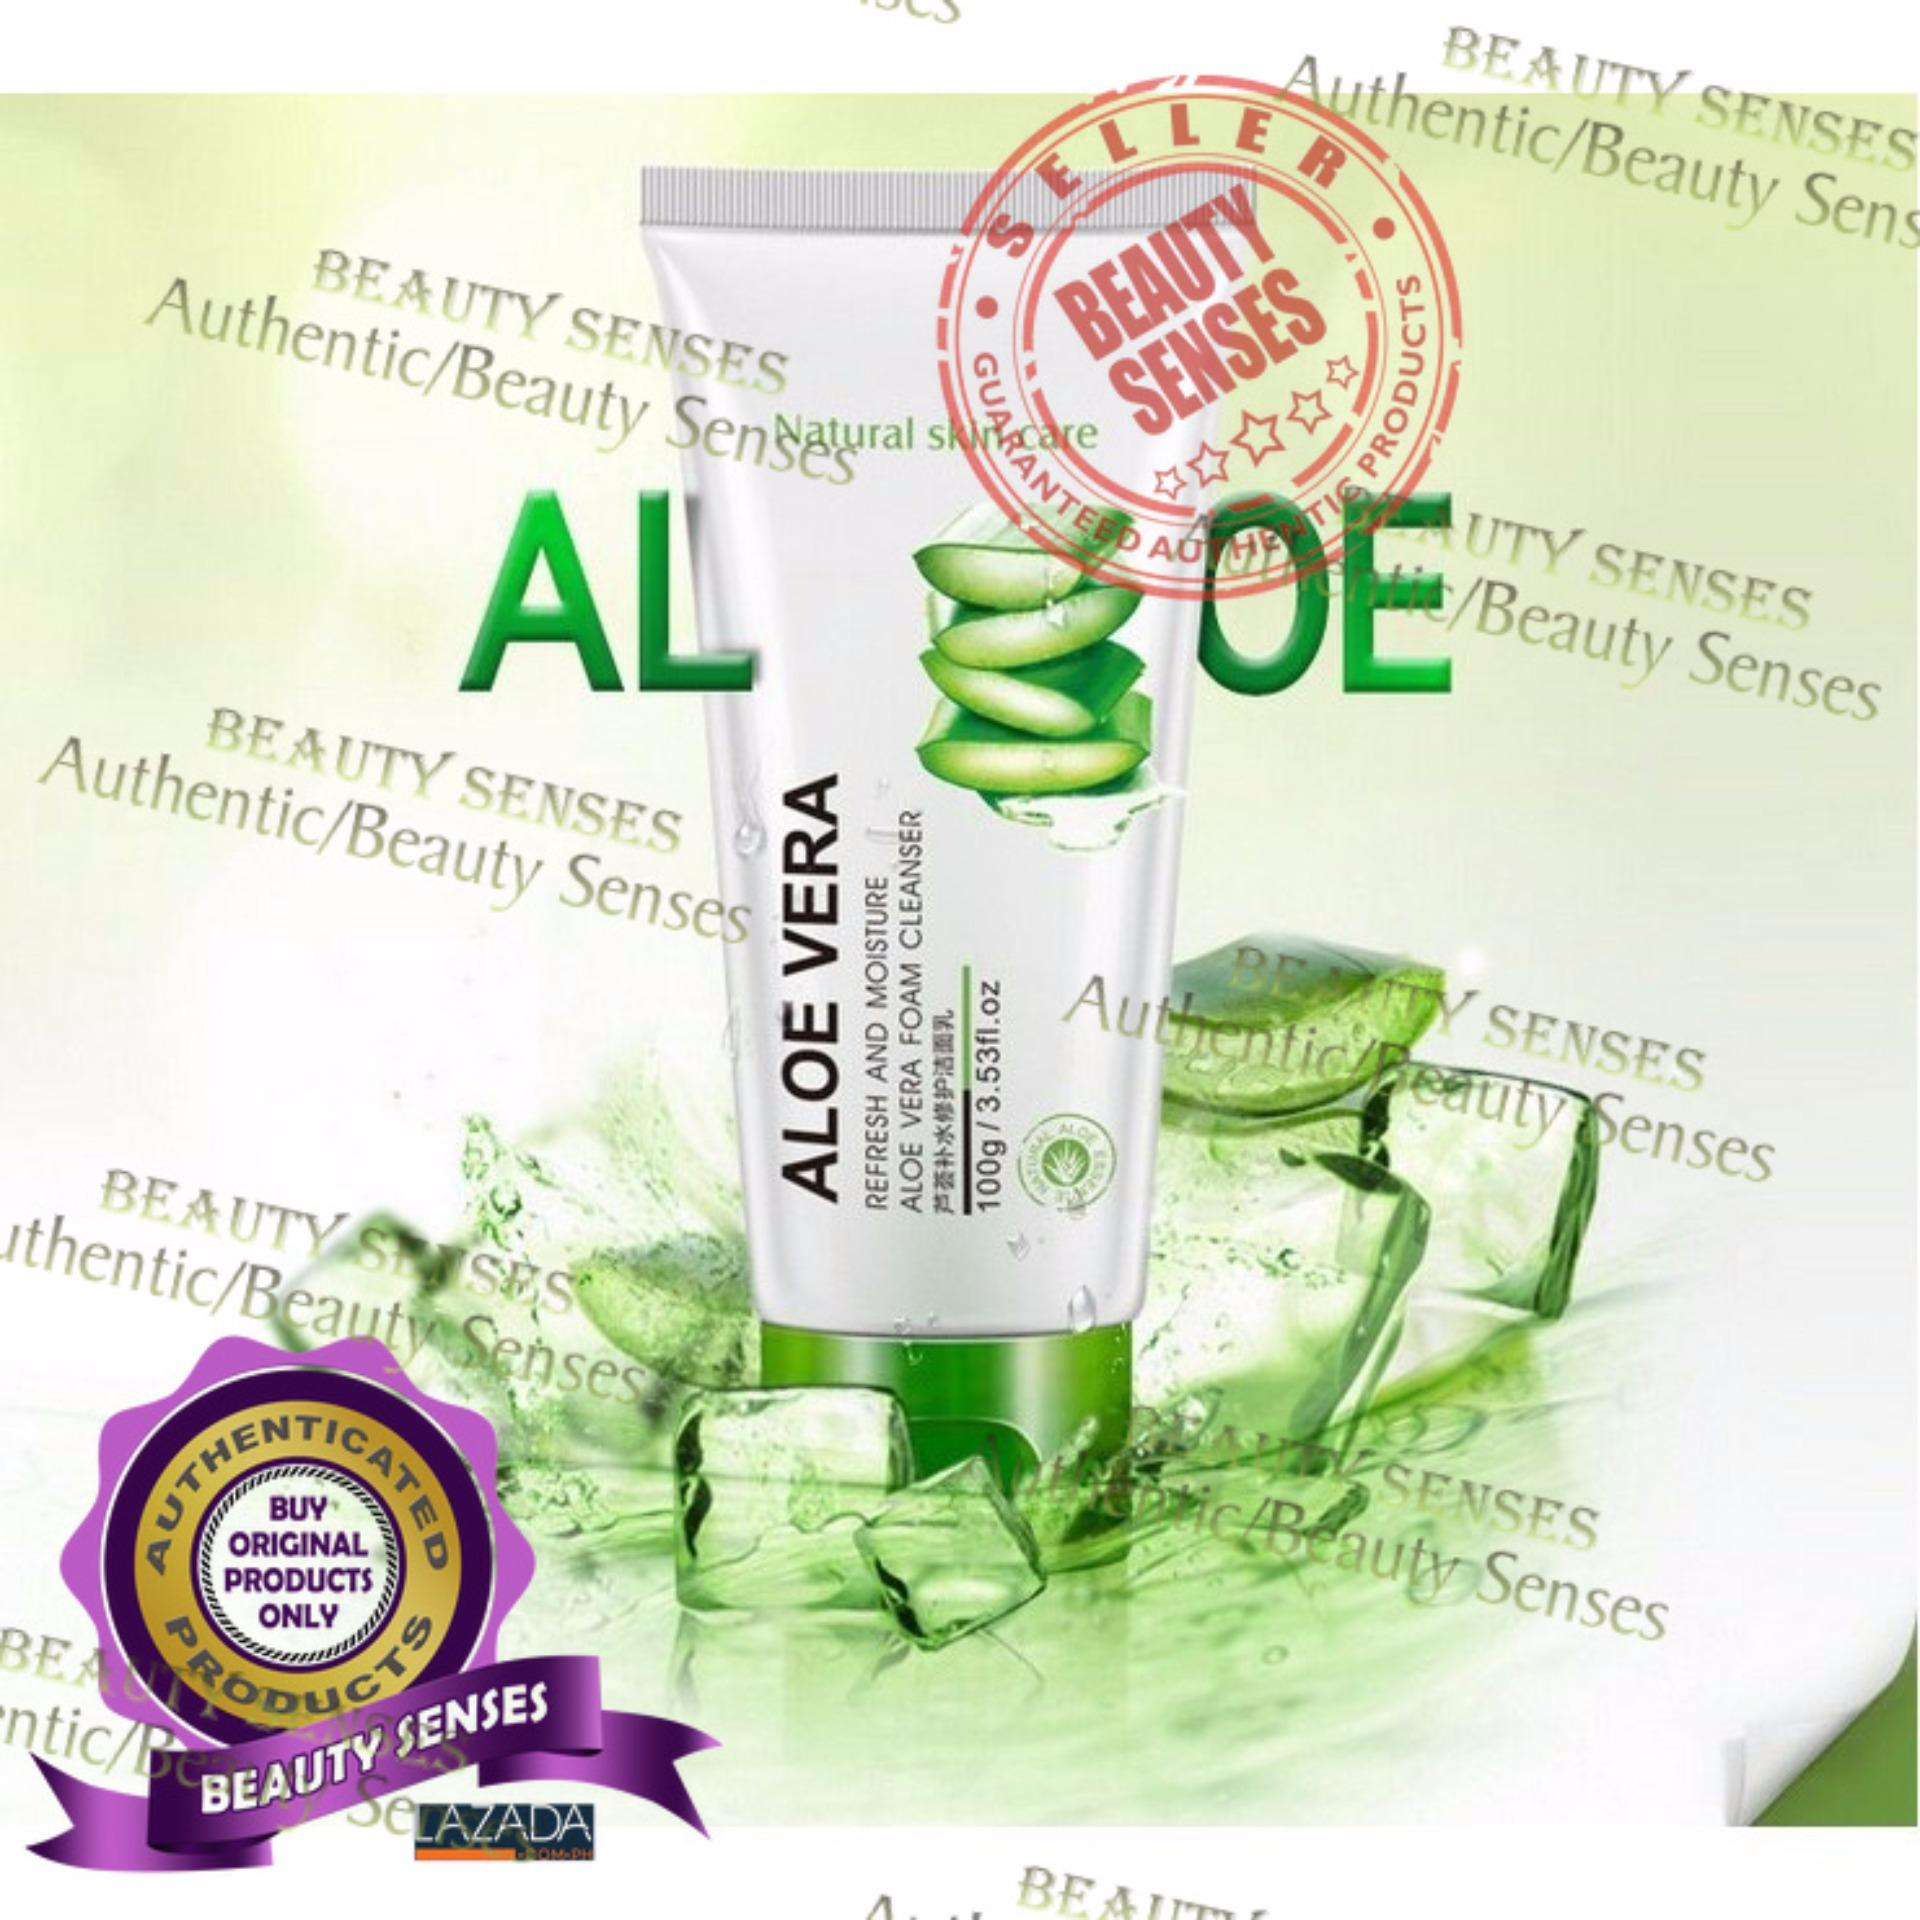 Philippines Bioaqua Natural Skin Care Moisture Aloe Vera 92 Aloevera Cleanser